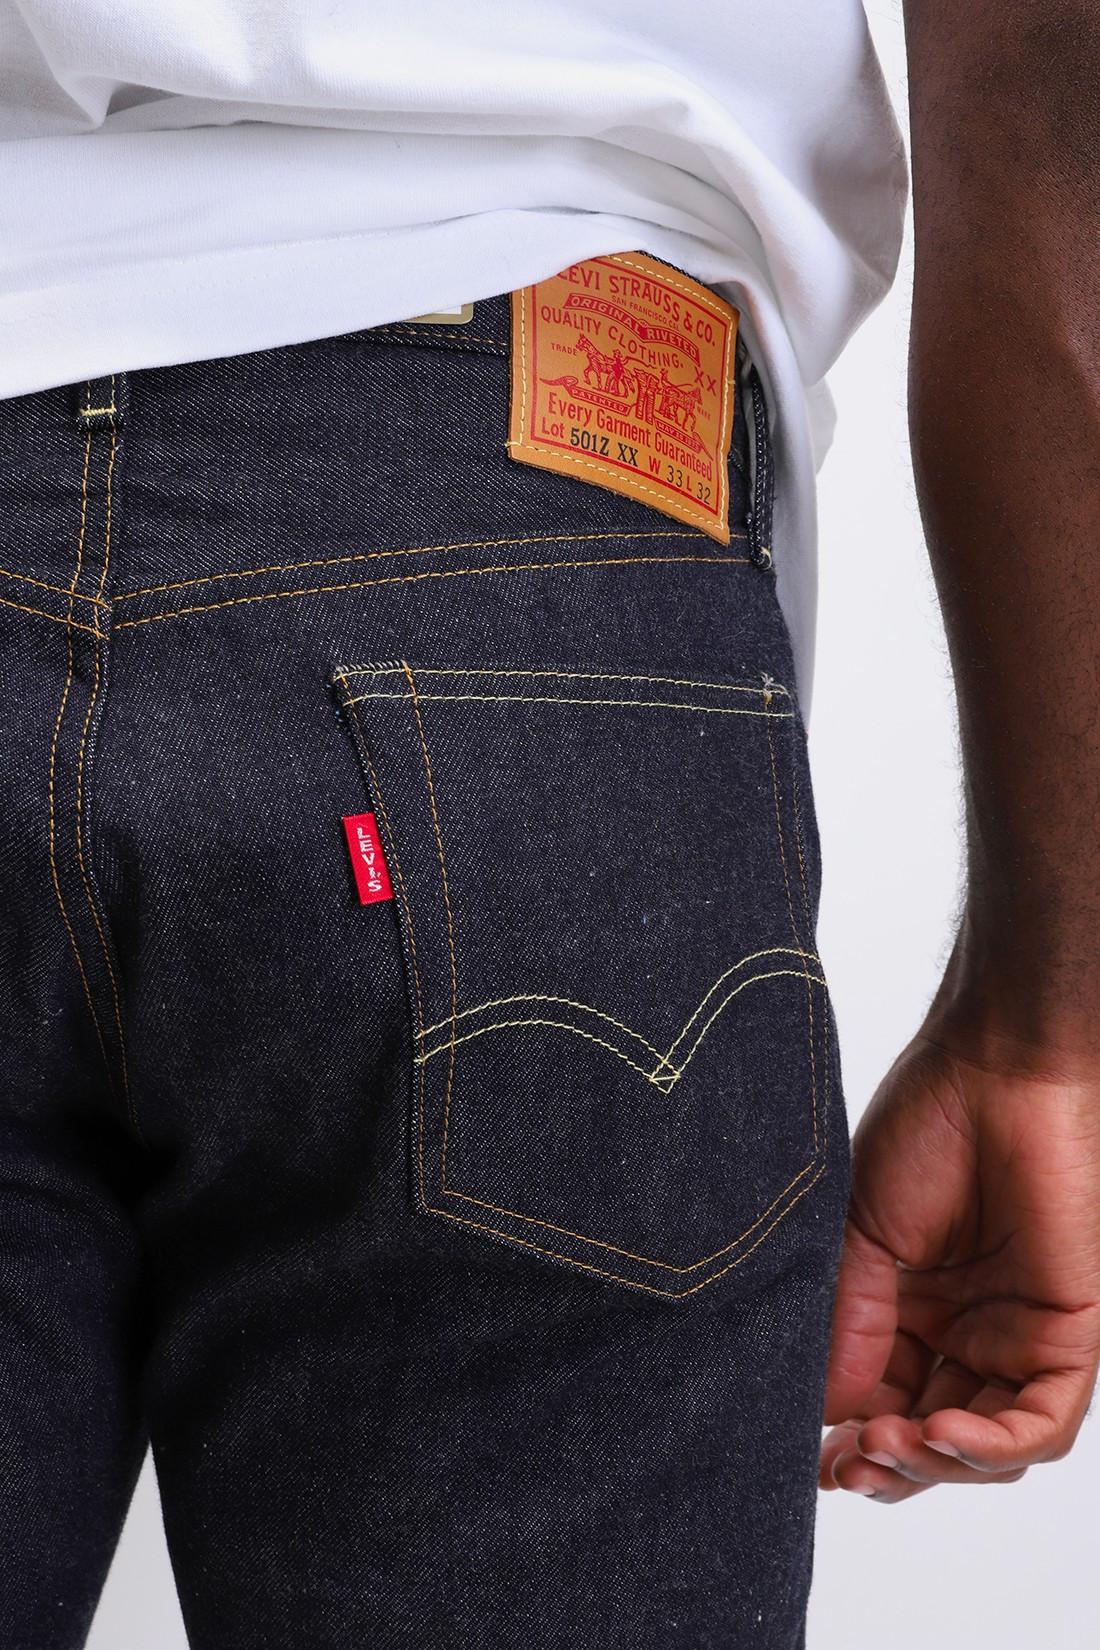 LEVI'S VINTAGE CLOTHING / 1954 501 jeans rigid C7835 v2